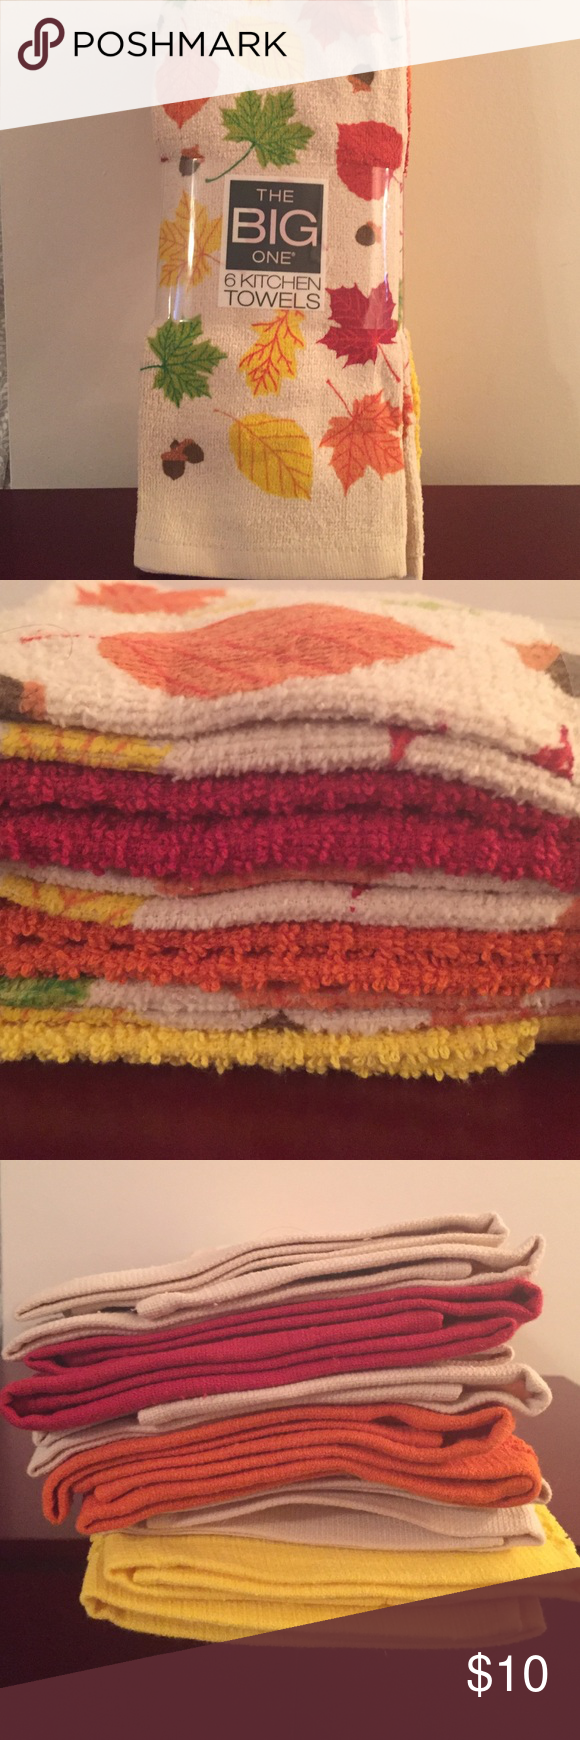 Nwt Kohls Fall And Christmas Kitchen Towels Nwt My Posh Picks